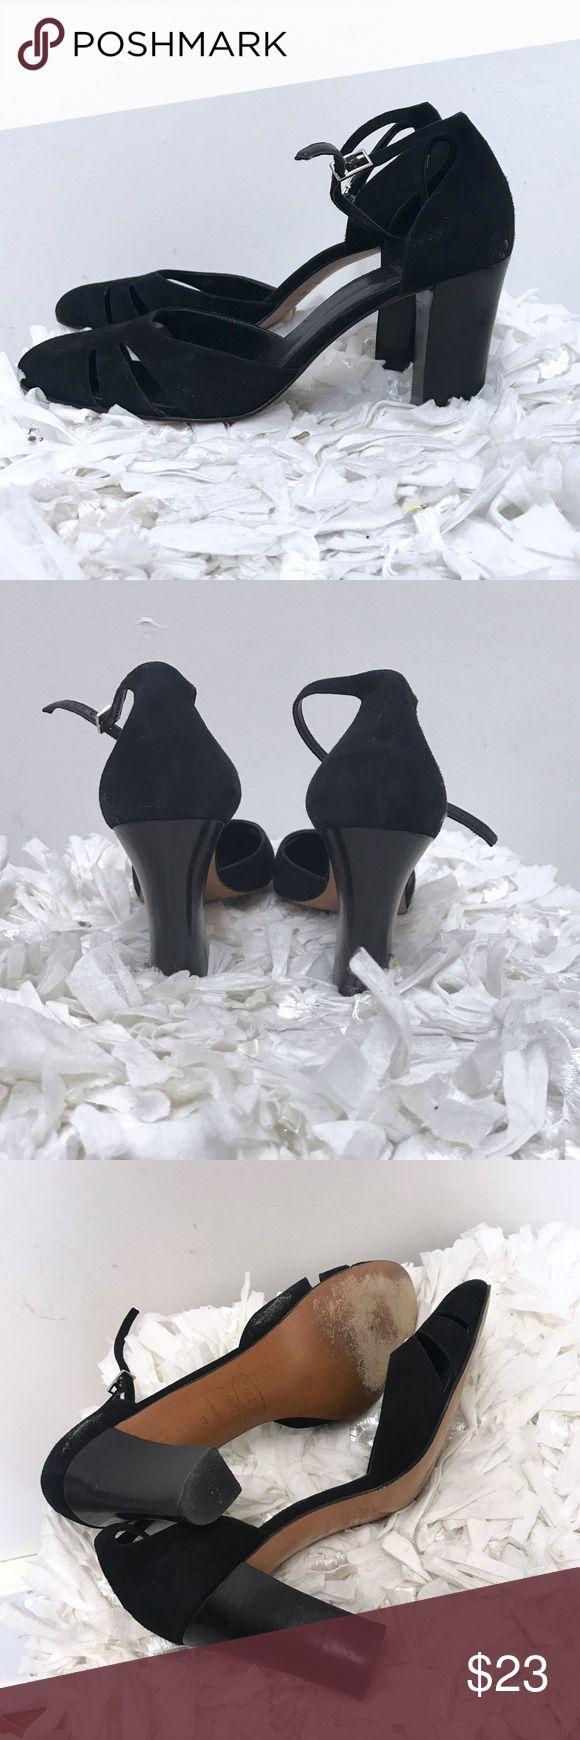 Circa Joan David shoes Sz 9 black Circa Joan David shoes. Sz 9. Very good condition. Bottom soles show normal wear. Joan & David Shoes Heels